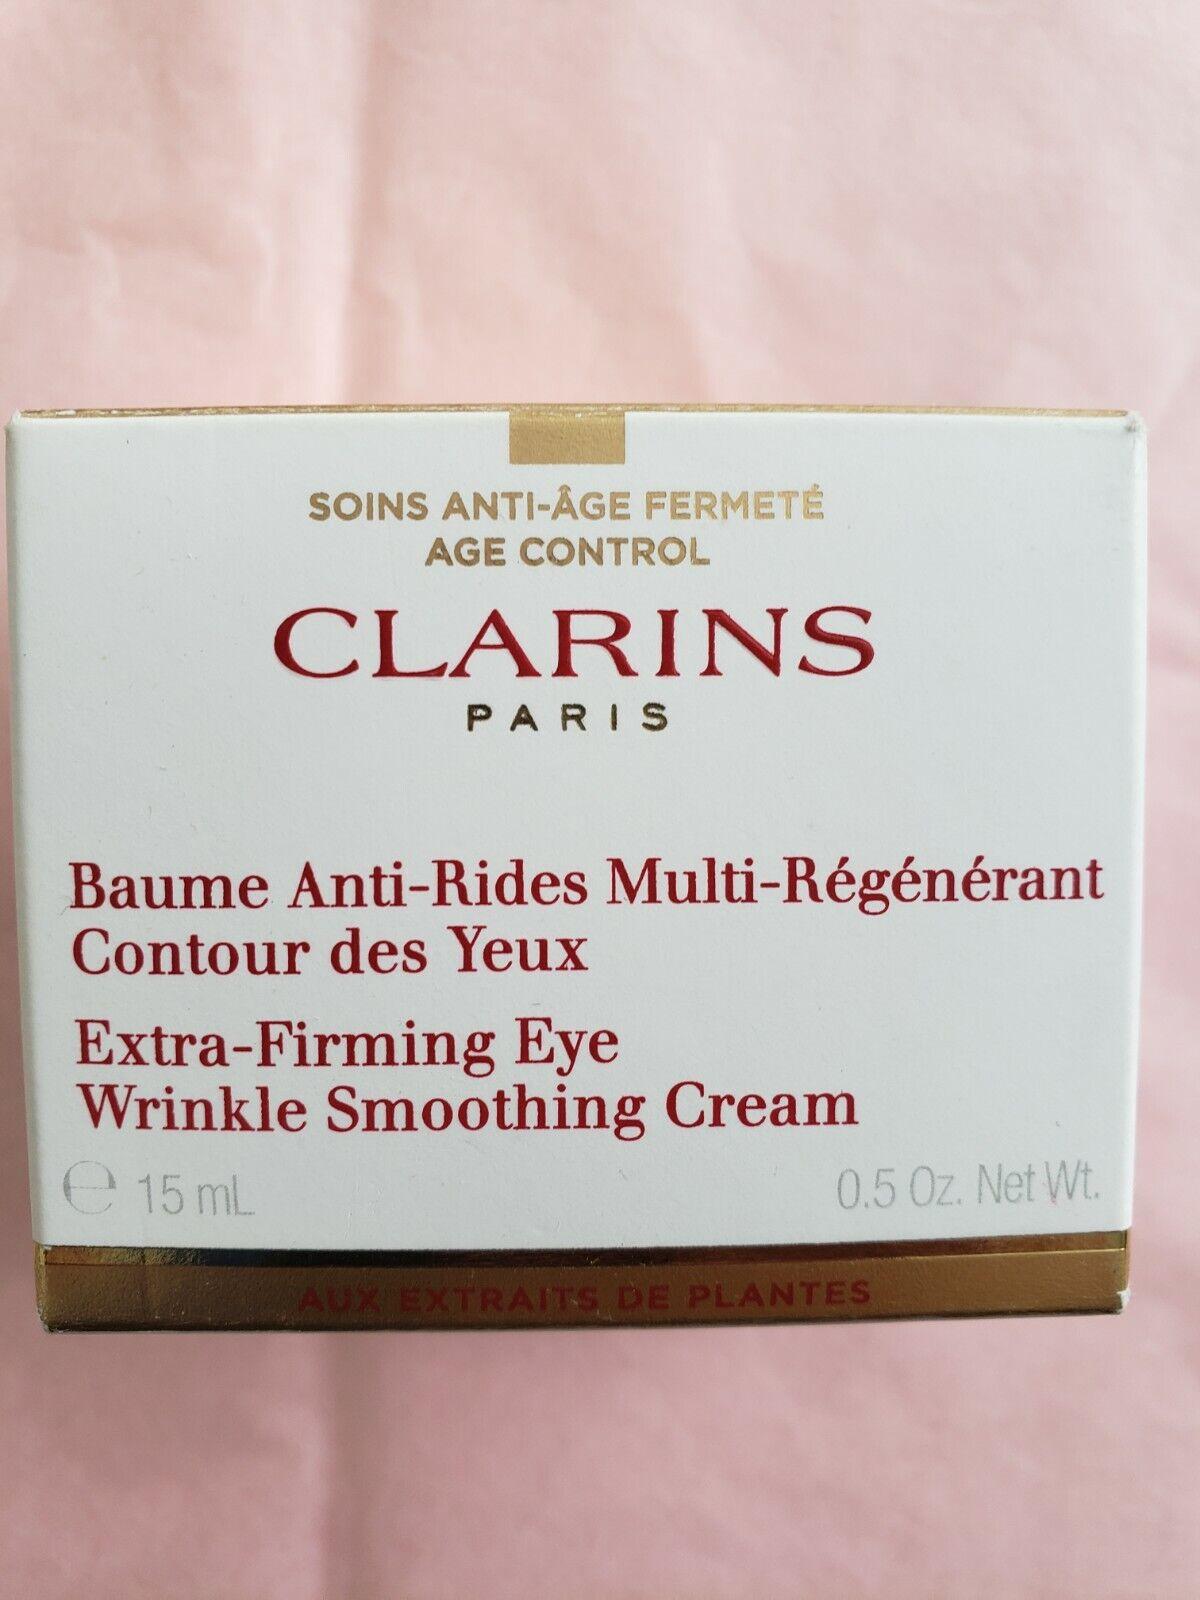 Clarins Extra-Firming Eye Wrinkle Smoothing Cream 0.5 oz